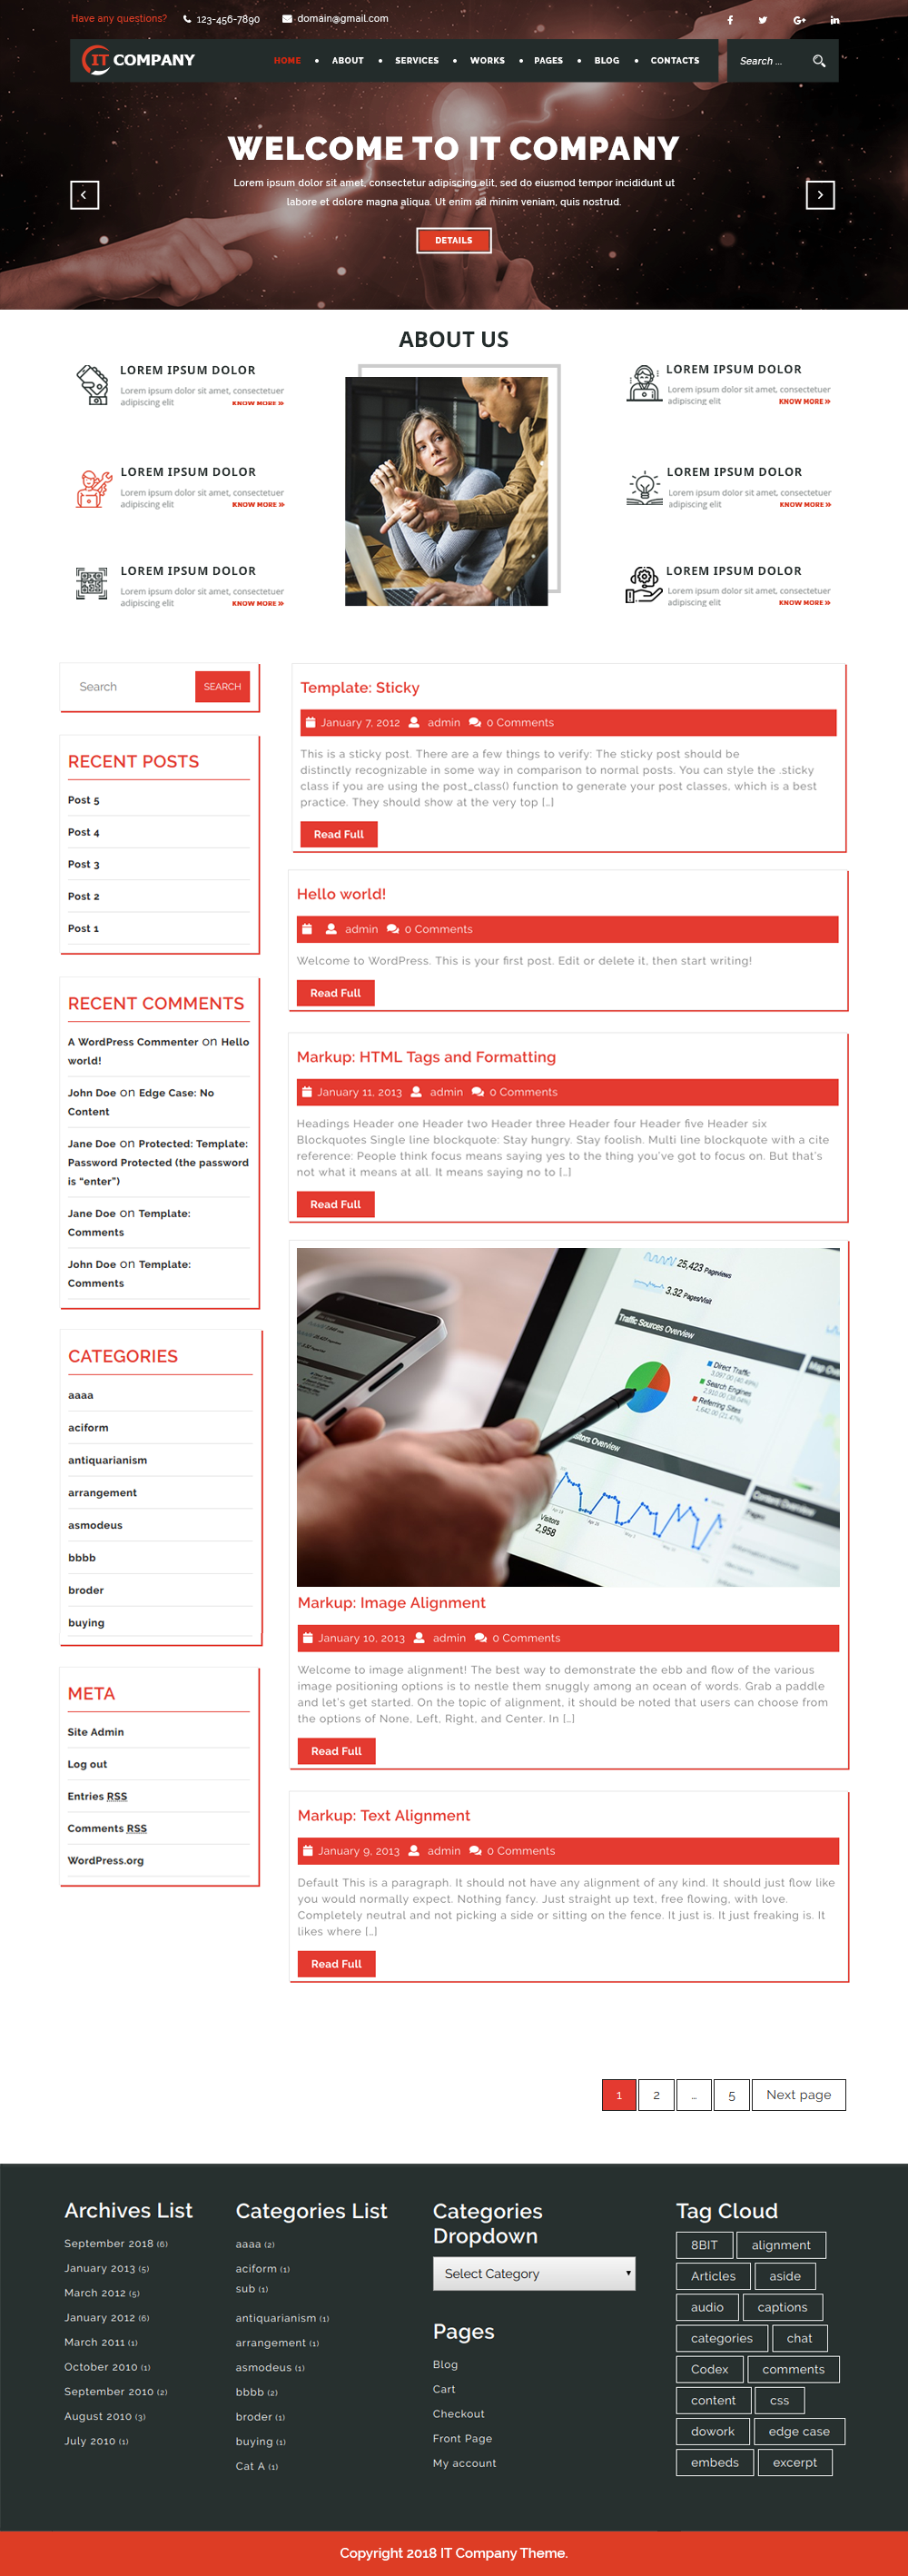 Free IT Company WordPress Theme